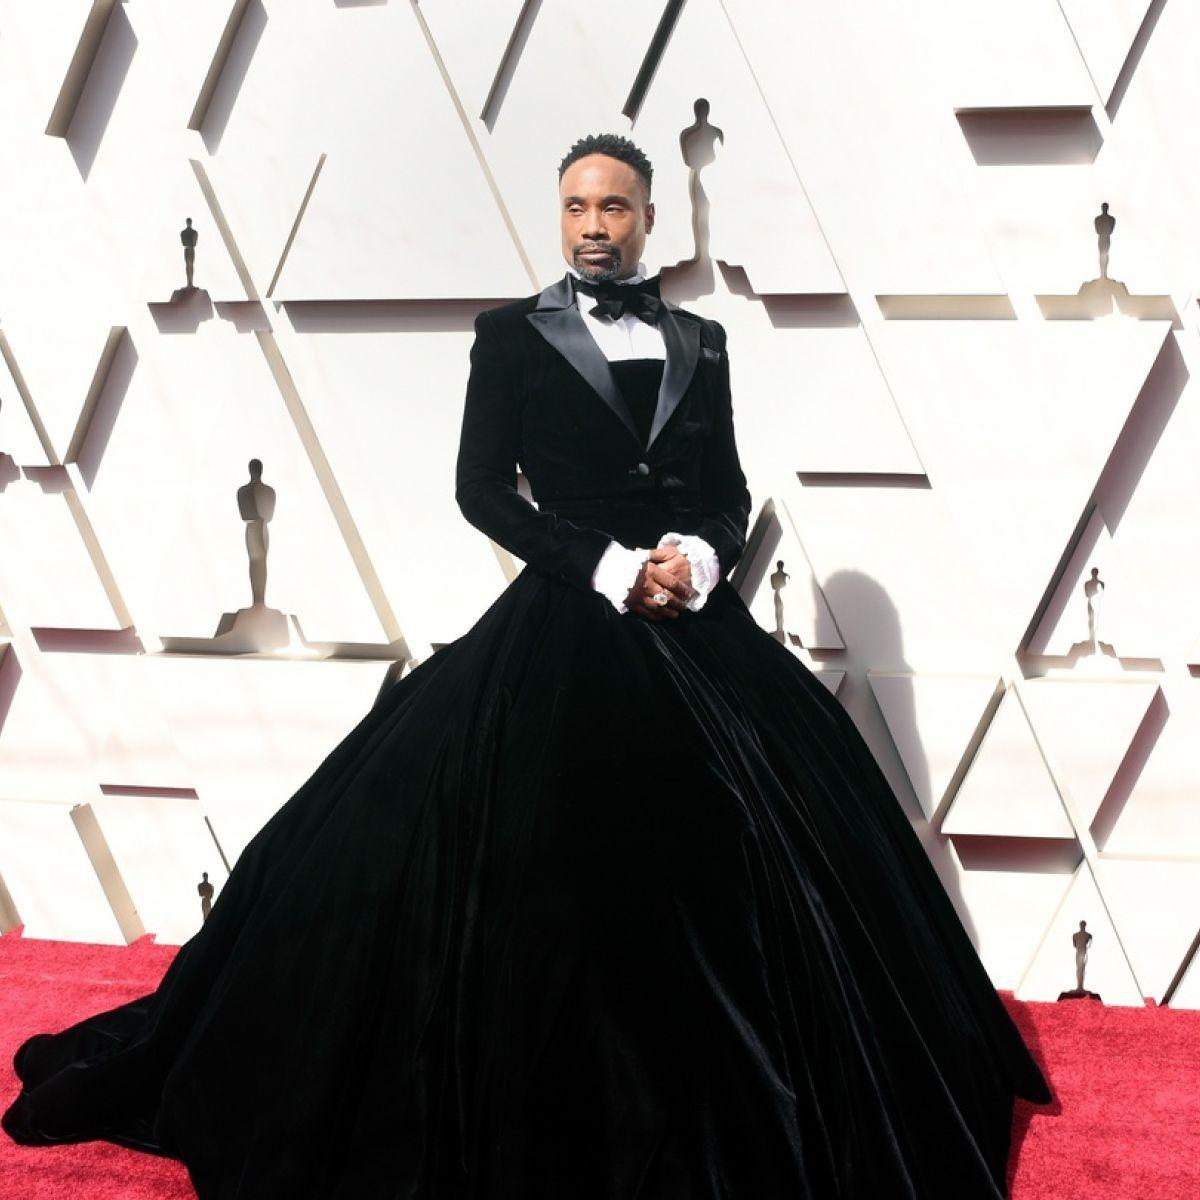 e51d67dc49e Oscars 2019  Billy Porter s tuxedo gown stuns the red carpet